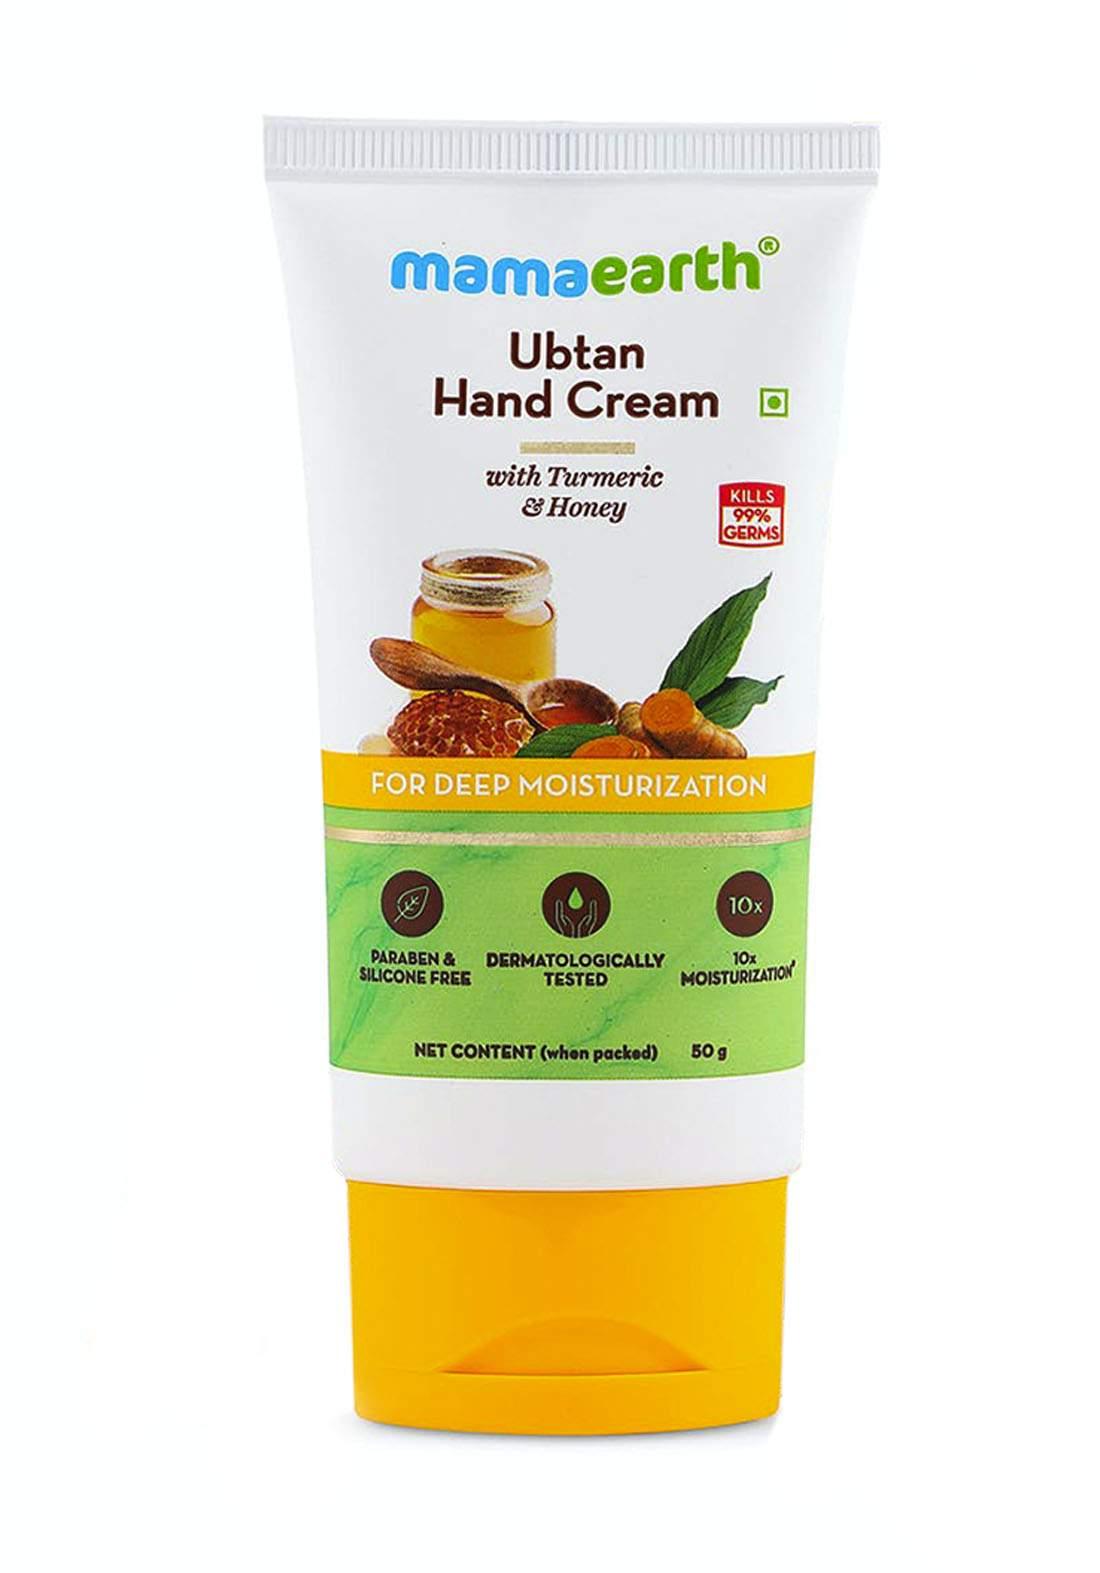 Mamaearth Ubtan Hand Cream 50g كريم لليدين